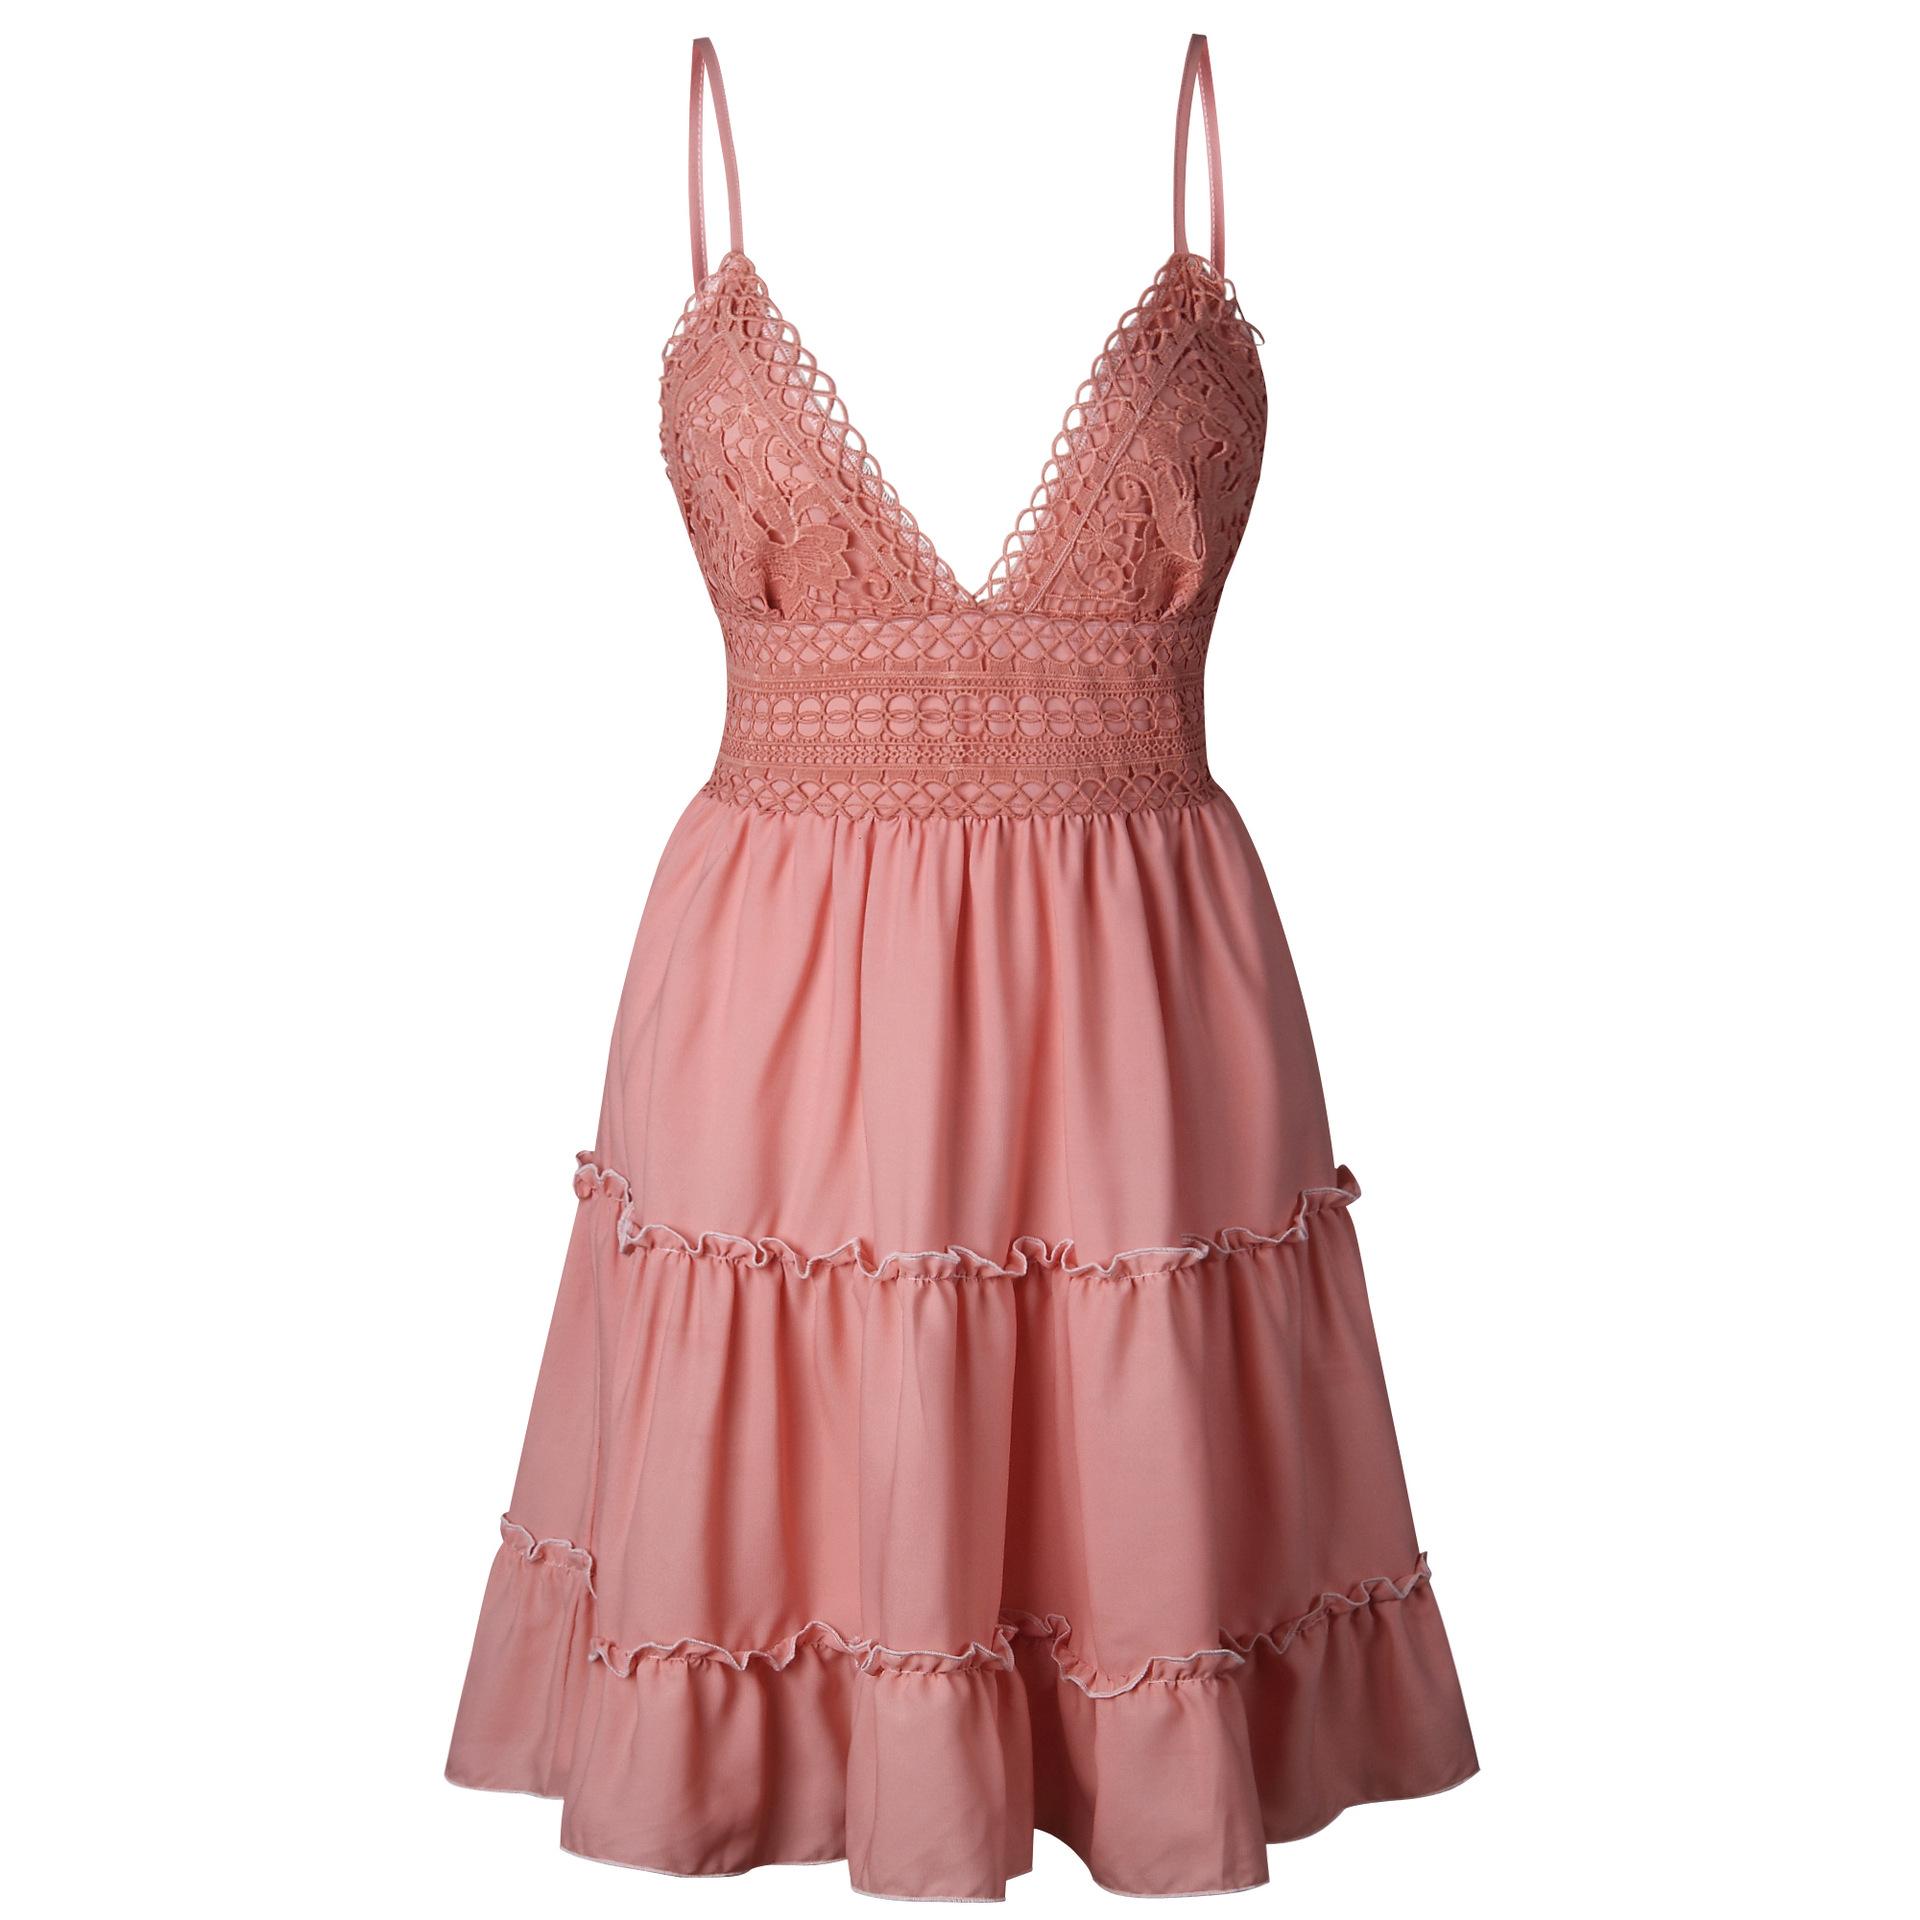 Summer Women Lace Dress Sexy Backless V-neck Beach Dresses 2018 Fashion Sleeveless Spaghetti Strap White Casual Mini Sundress